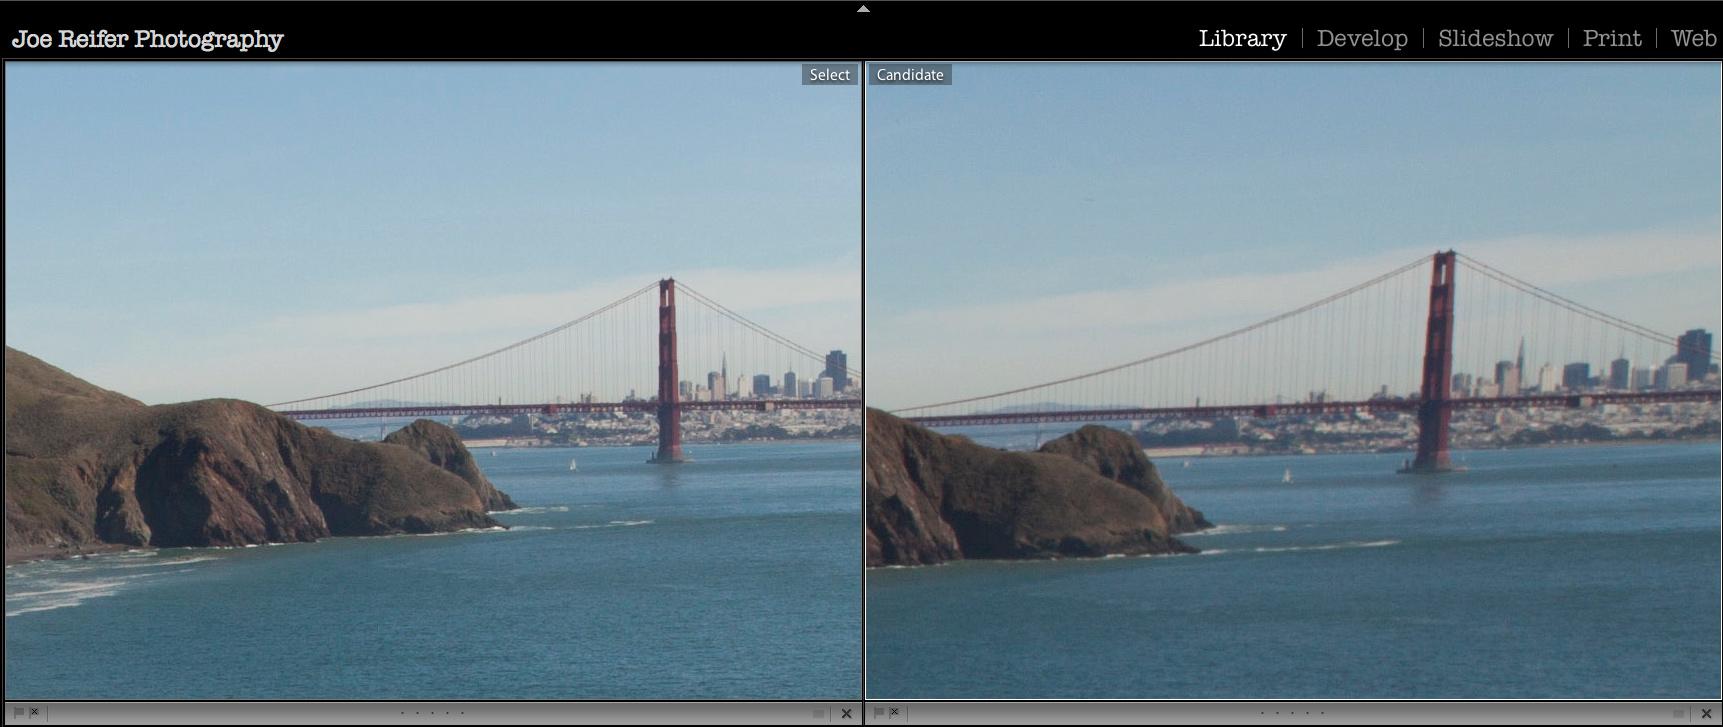 Canon 5D Mark II wide angle lens sharpness issues -- by Joe Reifer